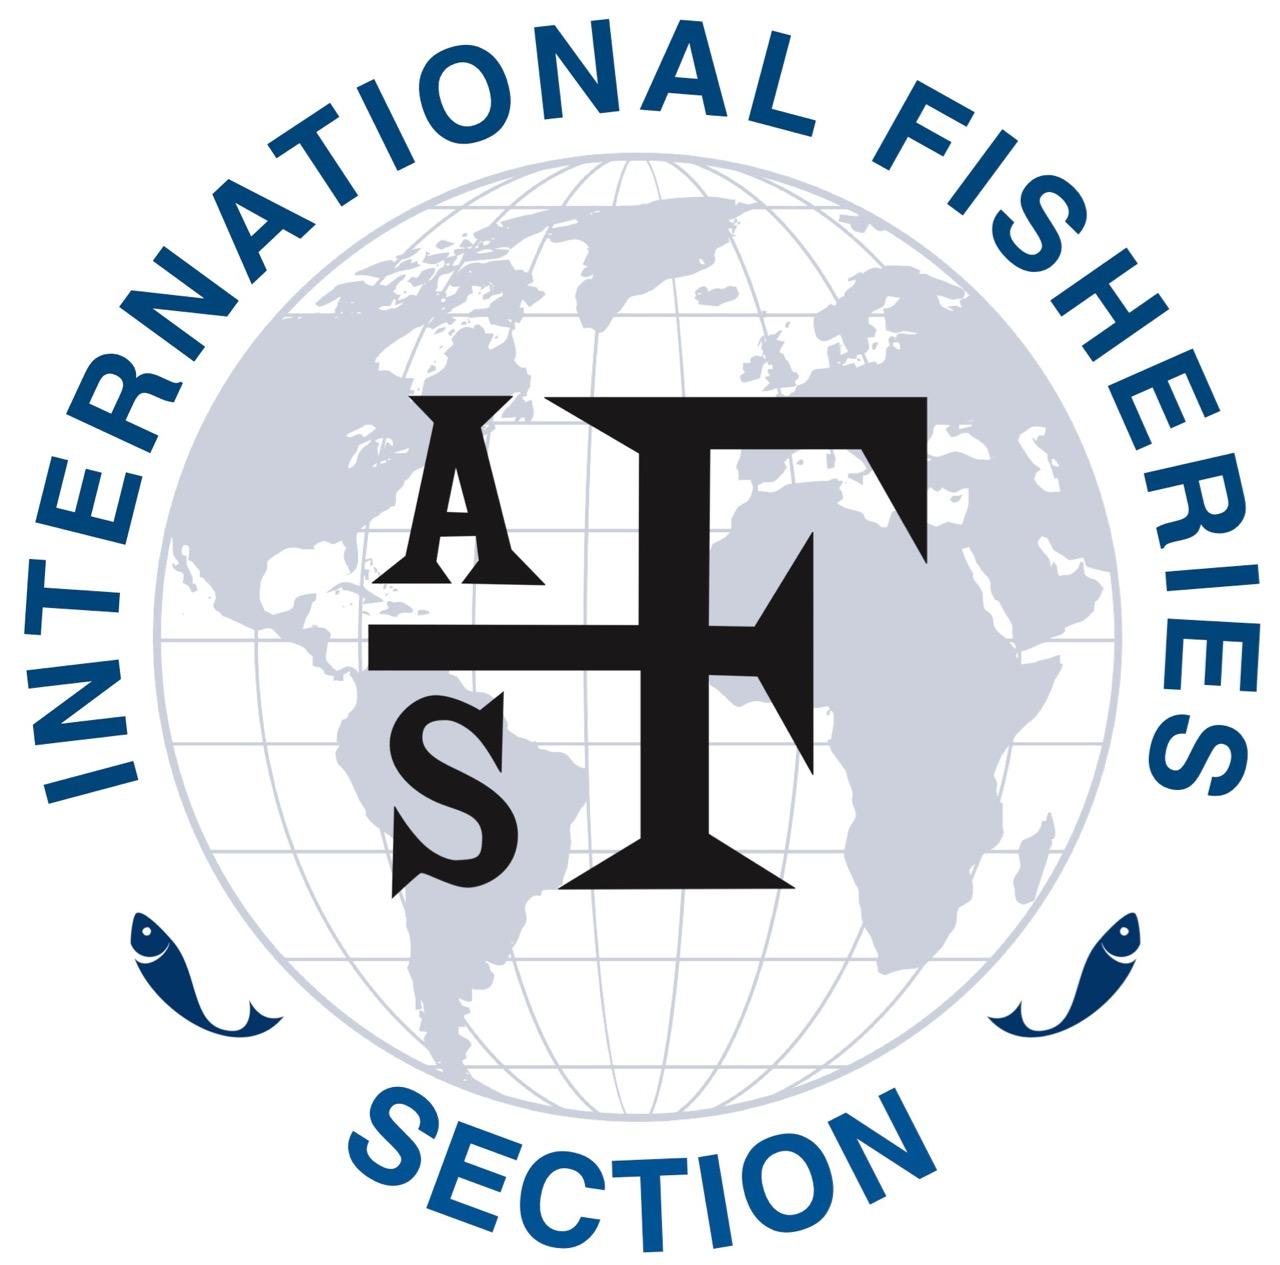 International Fisheries Section